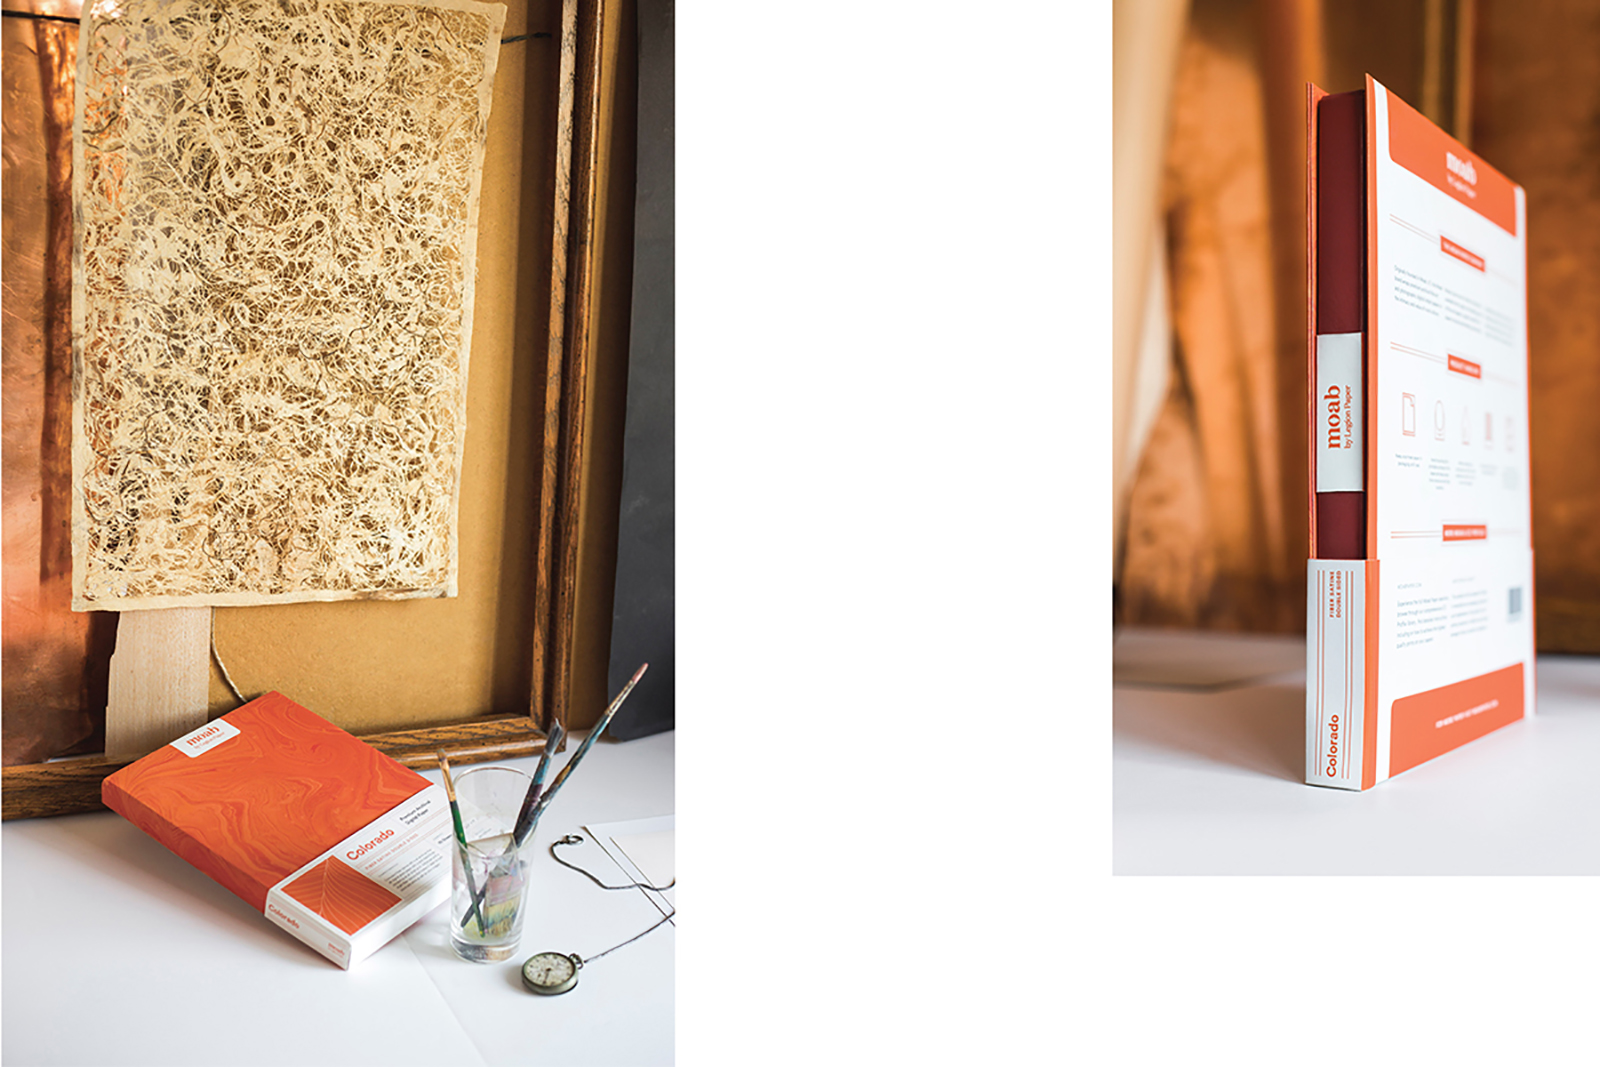 Moab纸张公司更新了全新的品牌形象-深圳VI设计3